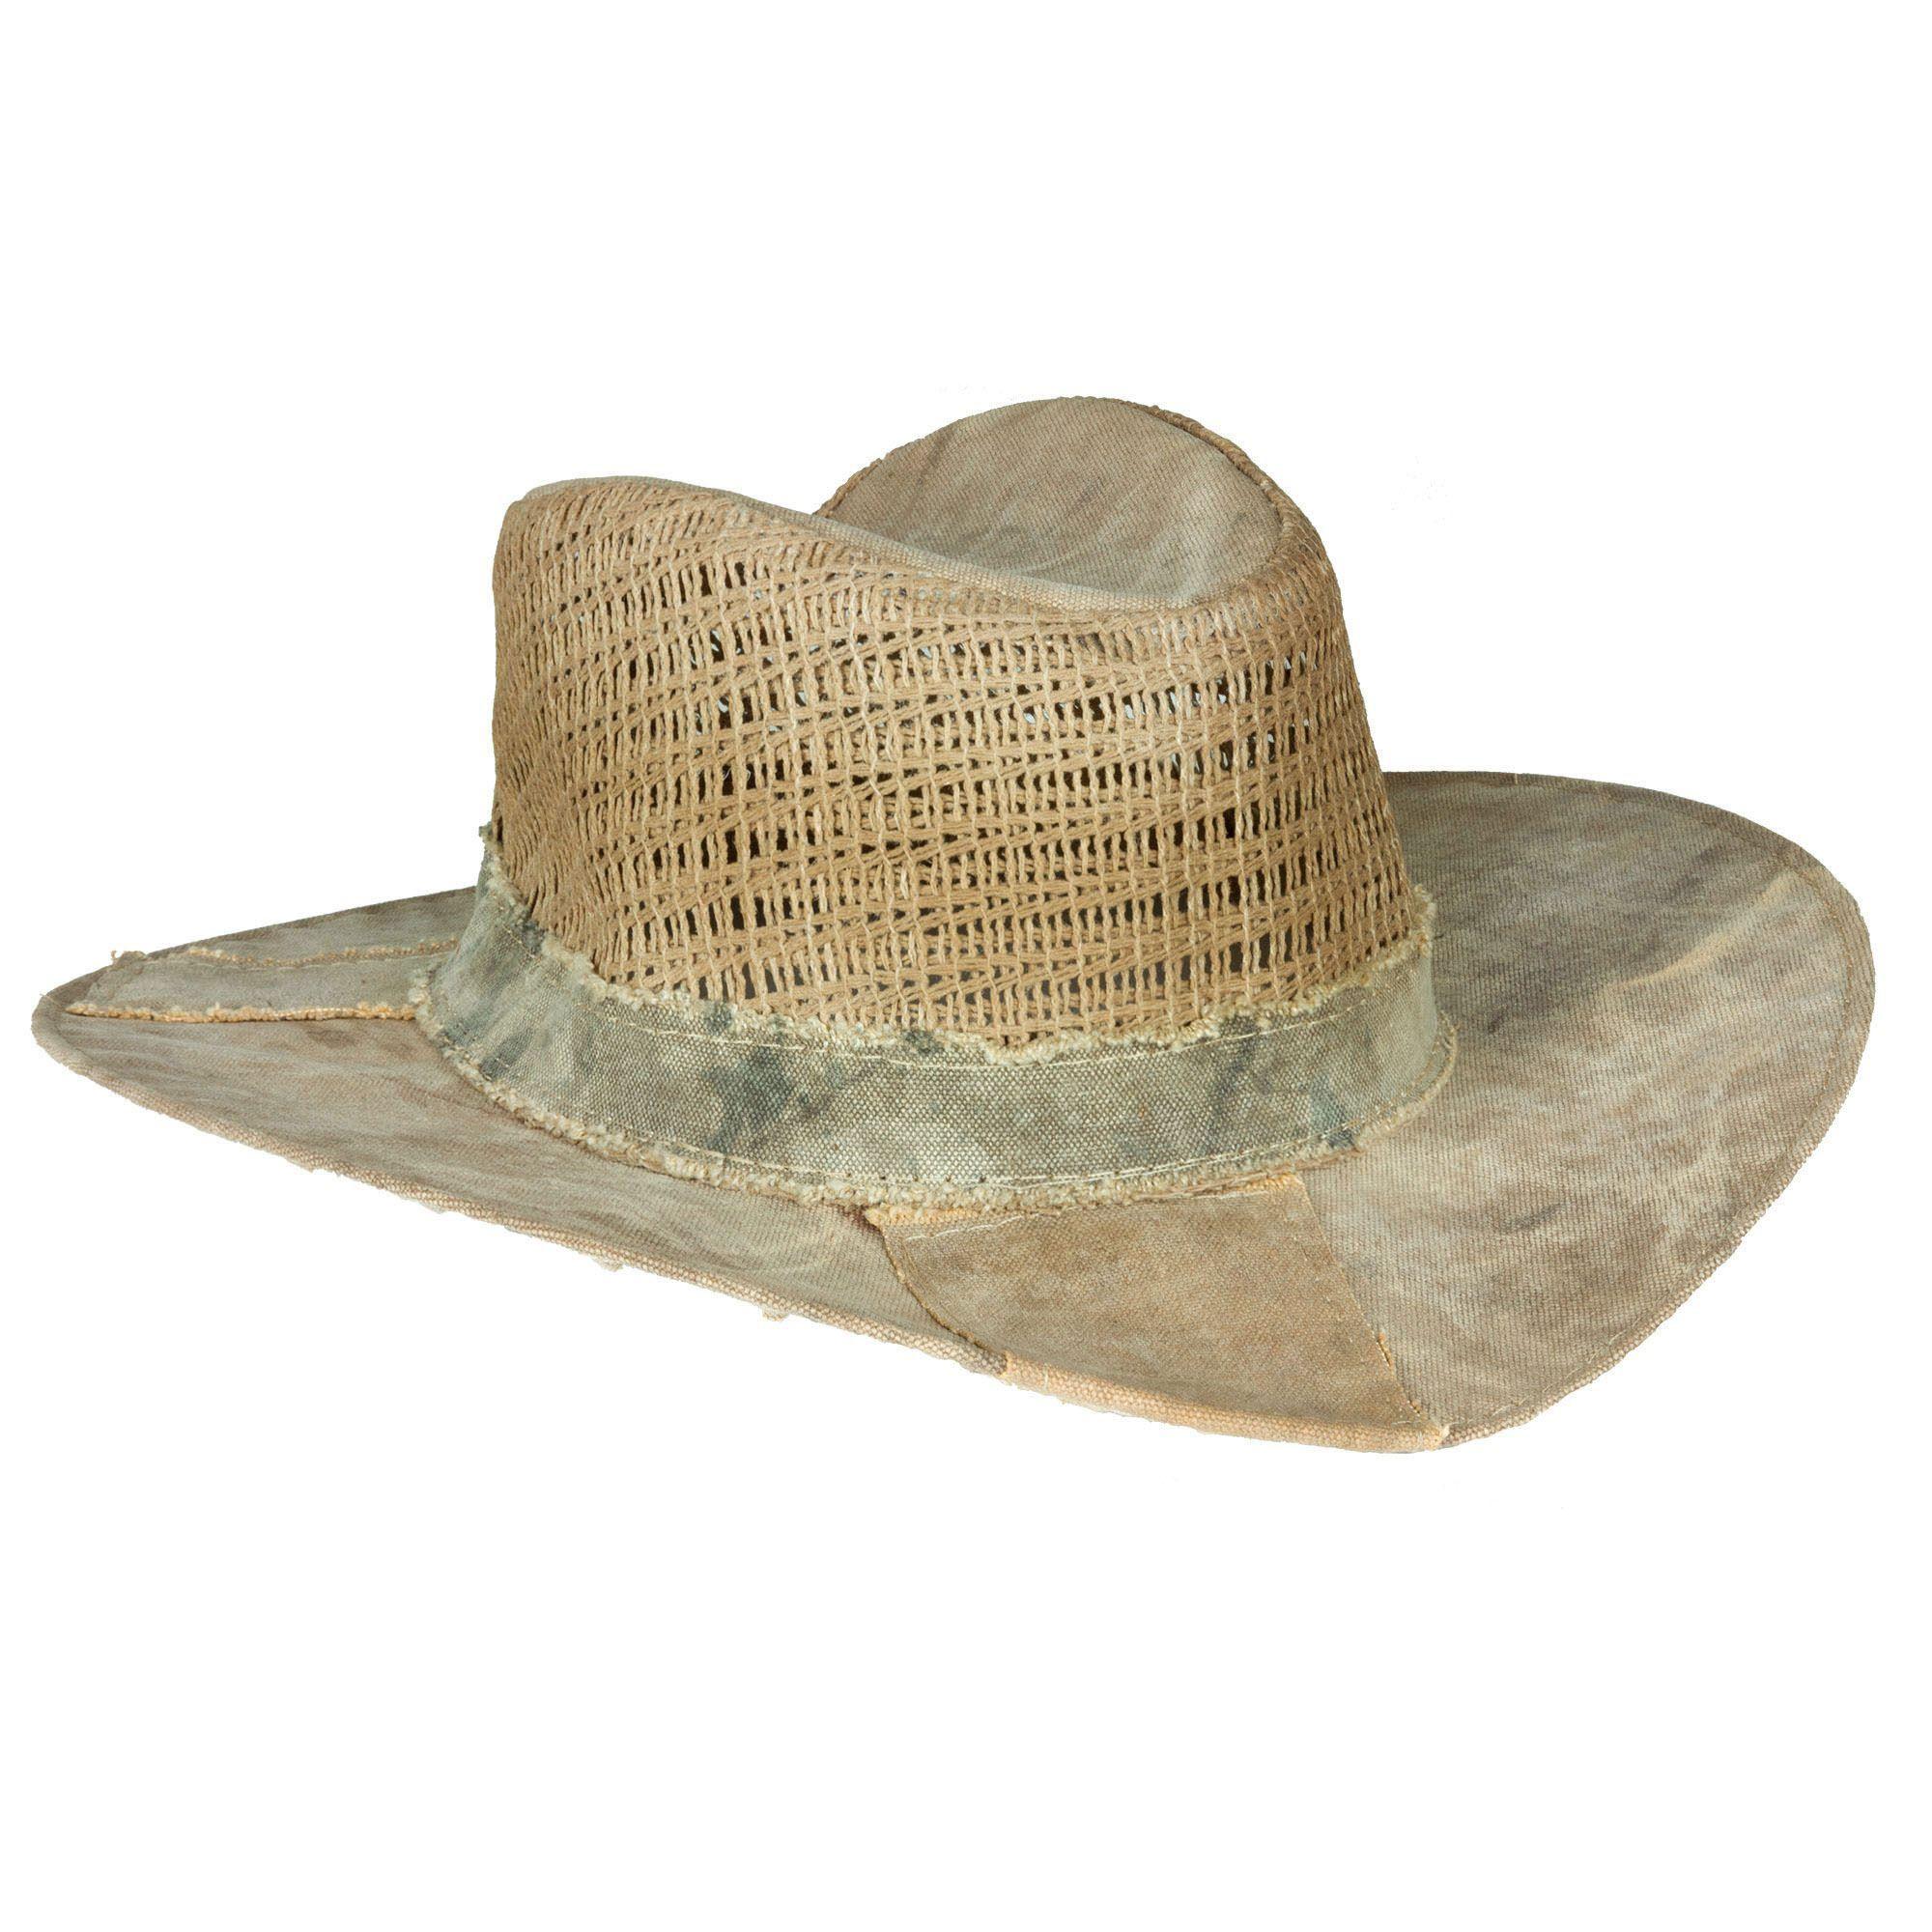 c8816350e02 Real Deal Brazil Brisa Tan Khaki Recycled Cotton Canvas Tarp Hat ...